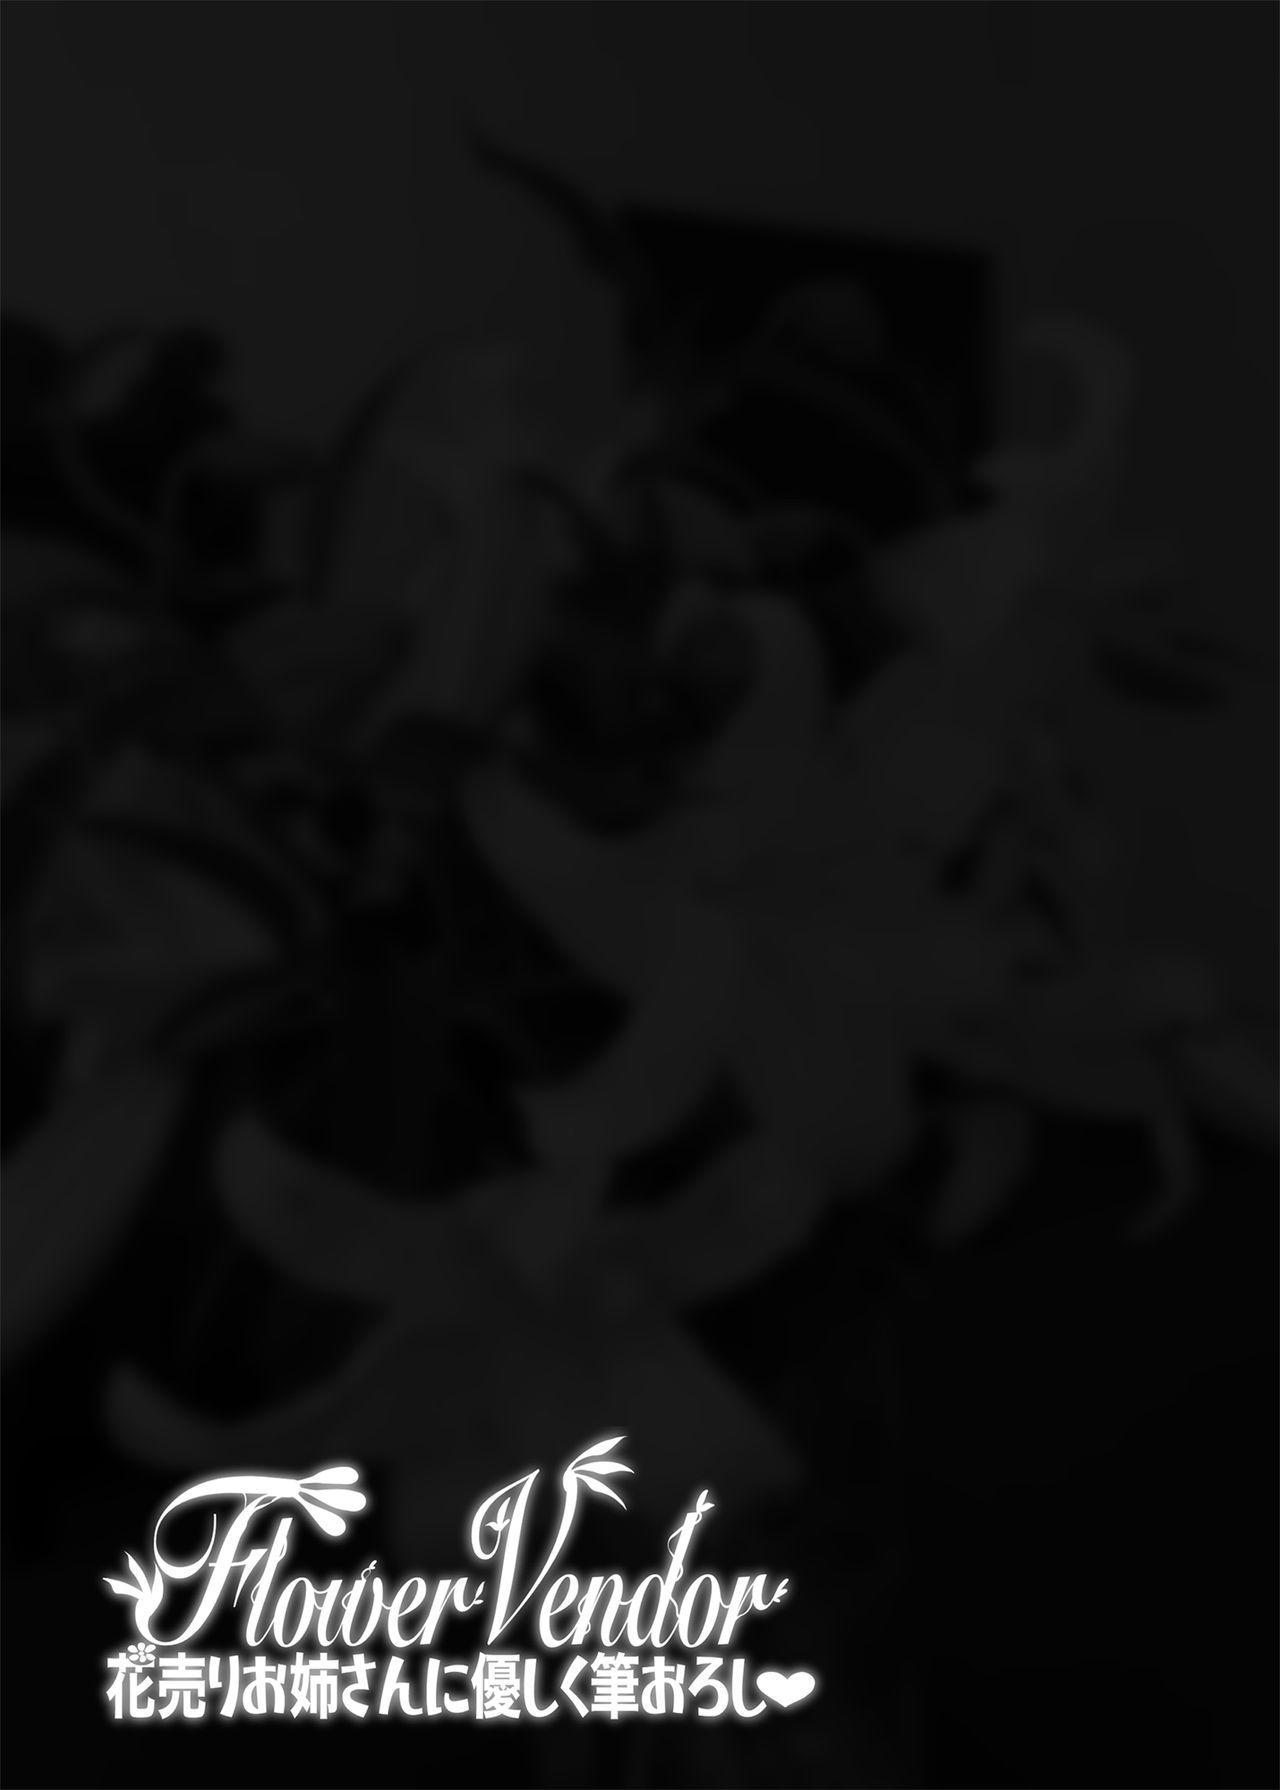 [ERECT TOUCH (Erect Sawaru)] Flower Vendor ~Hanauri Onee-san ni Yasashiku Fudeoroshi~ | Flower Vendor ~Gently Losing My Virginity To Miss Flower Vendor~ [English] [RedLantern] 36